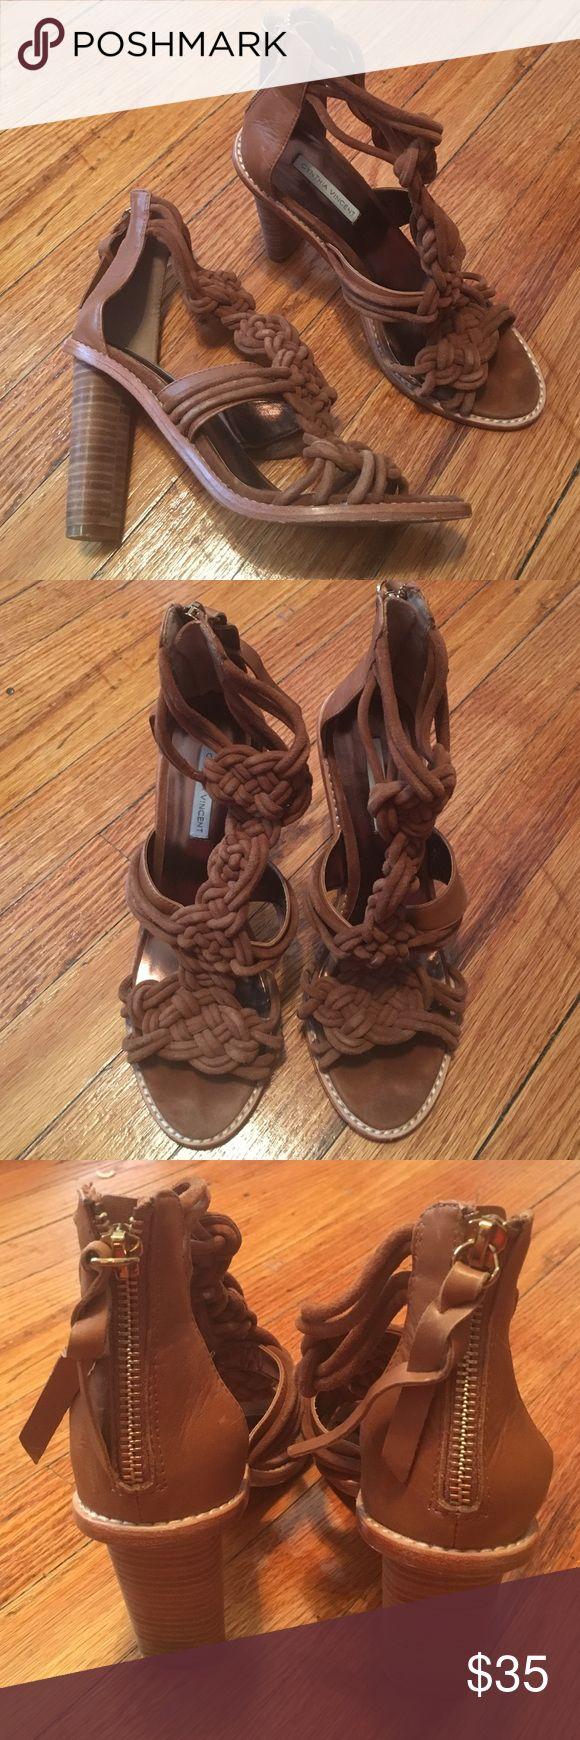 Cynthia Vincent Tan Suede Dress Sandal 4-inch heel Cynthia Vincent Shoes Heels